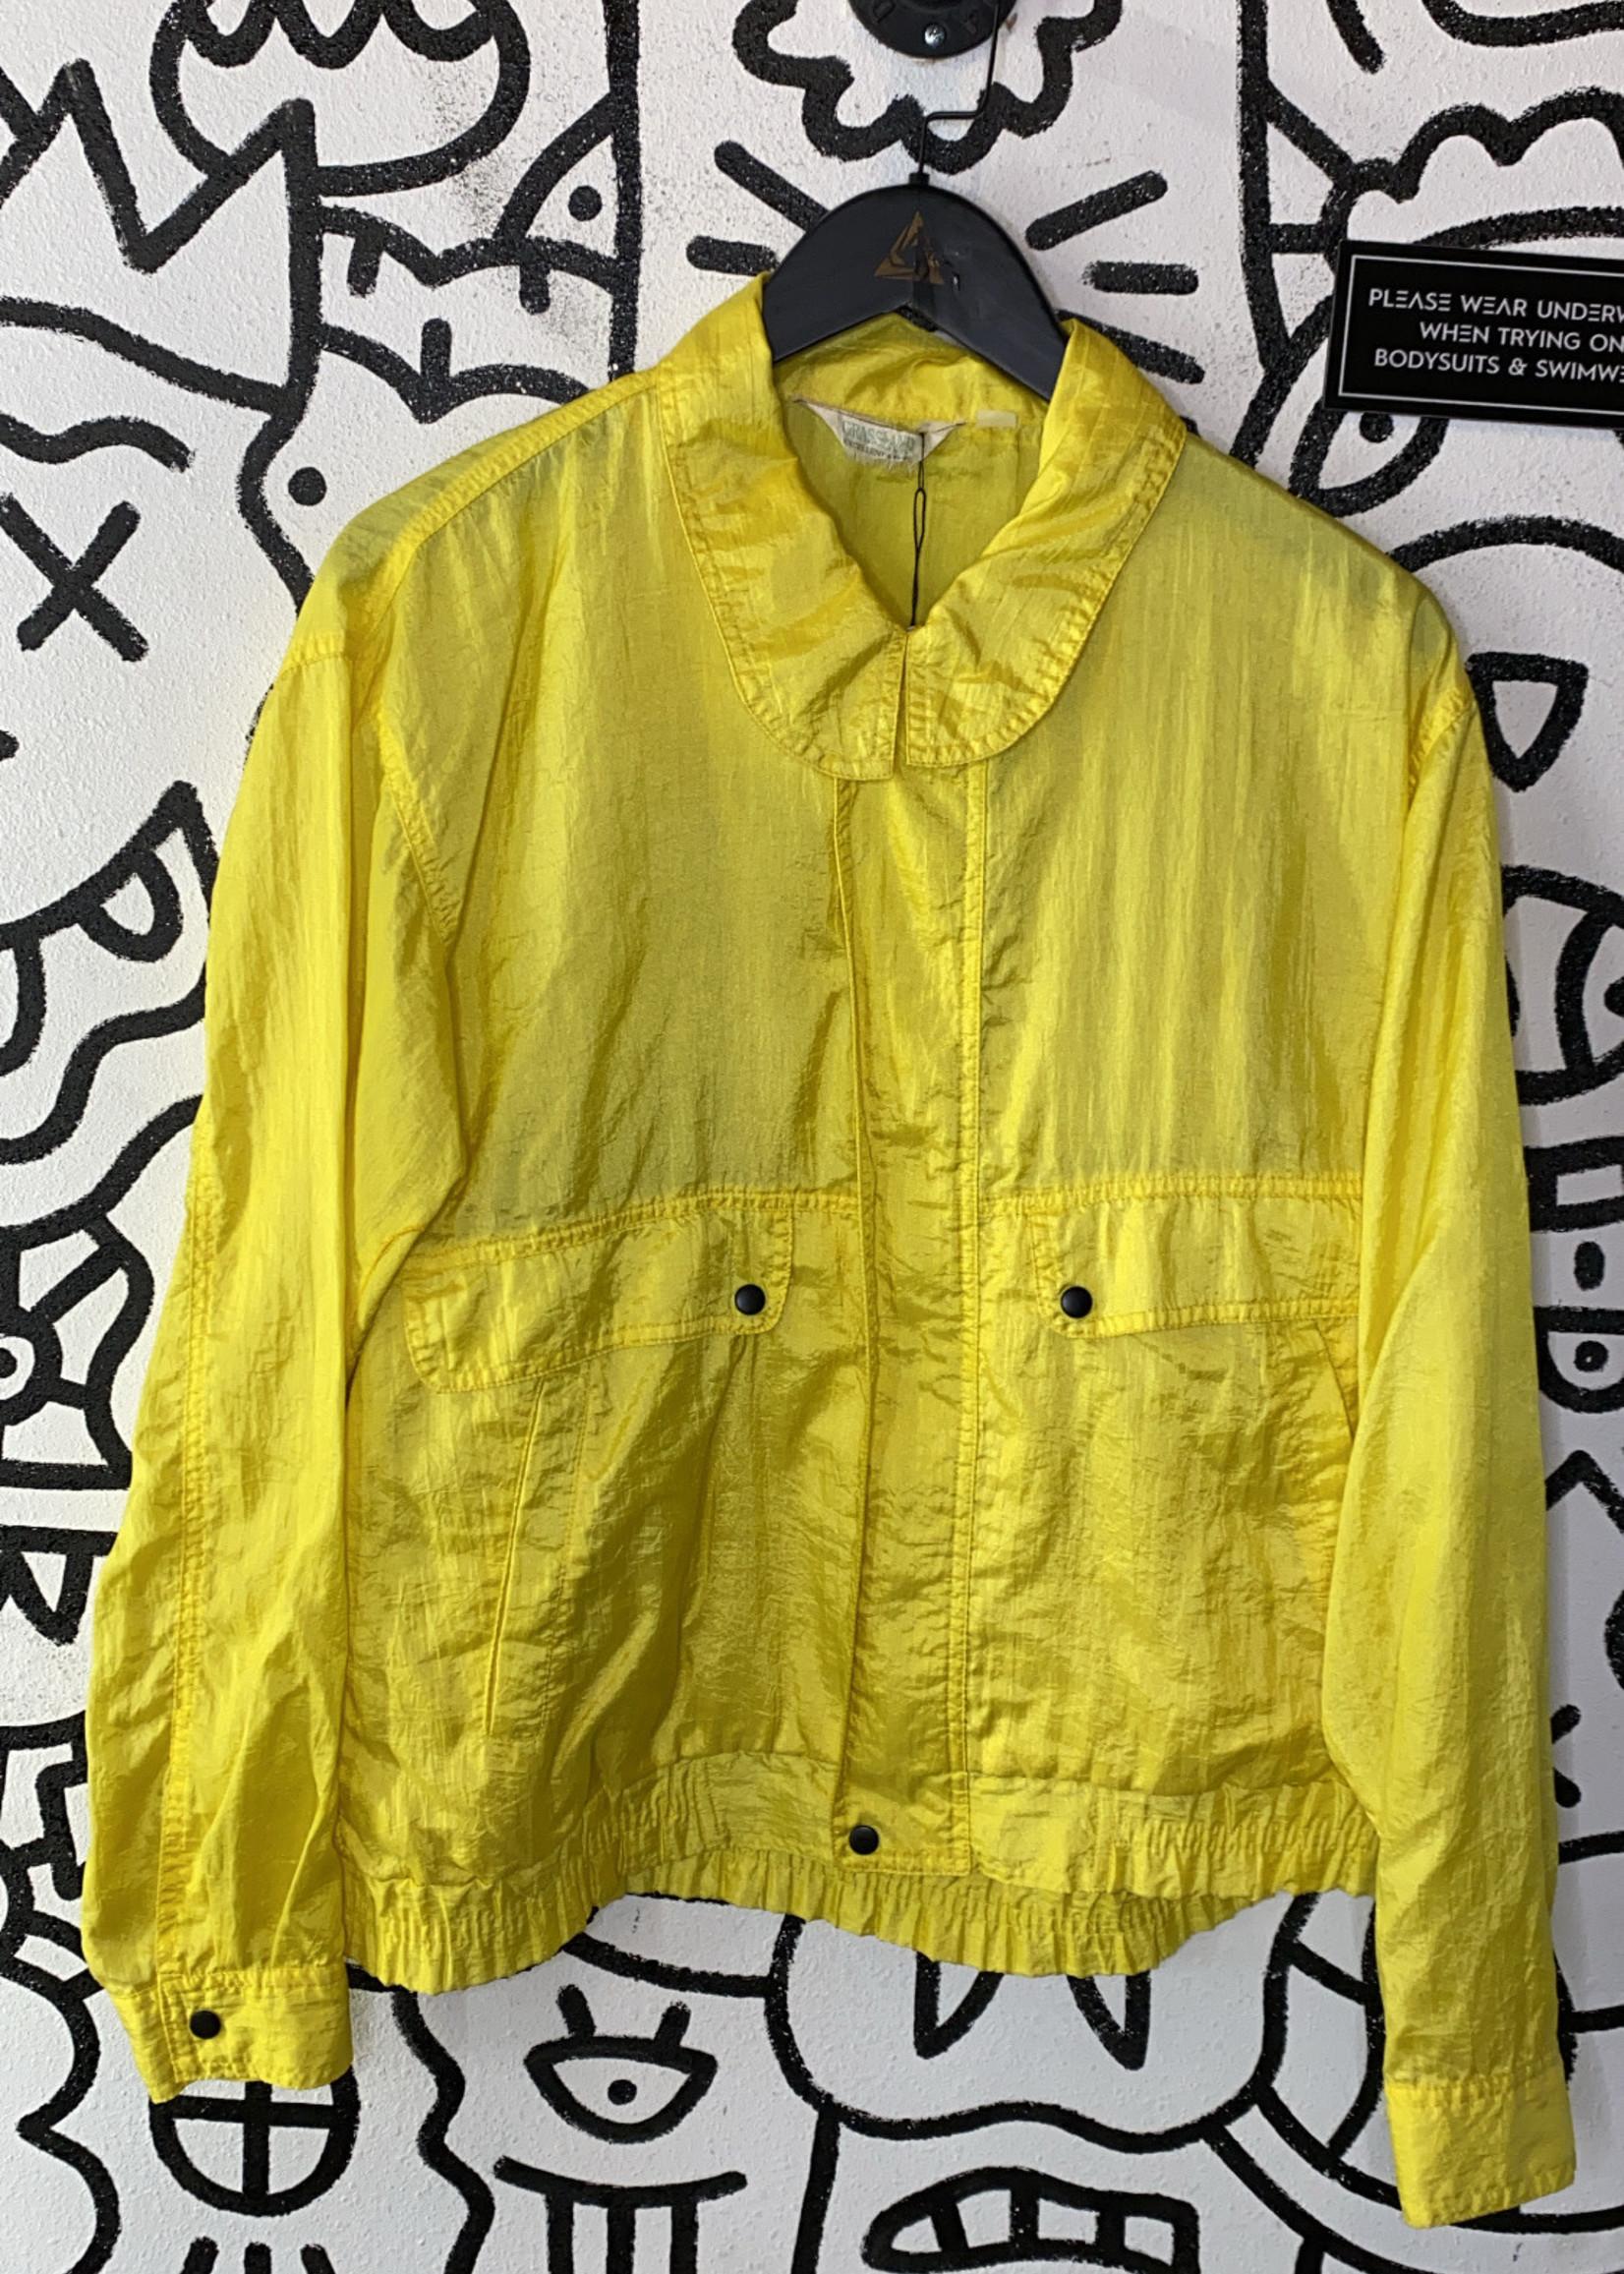 Grassland Vintage Yellow Windbreaker S